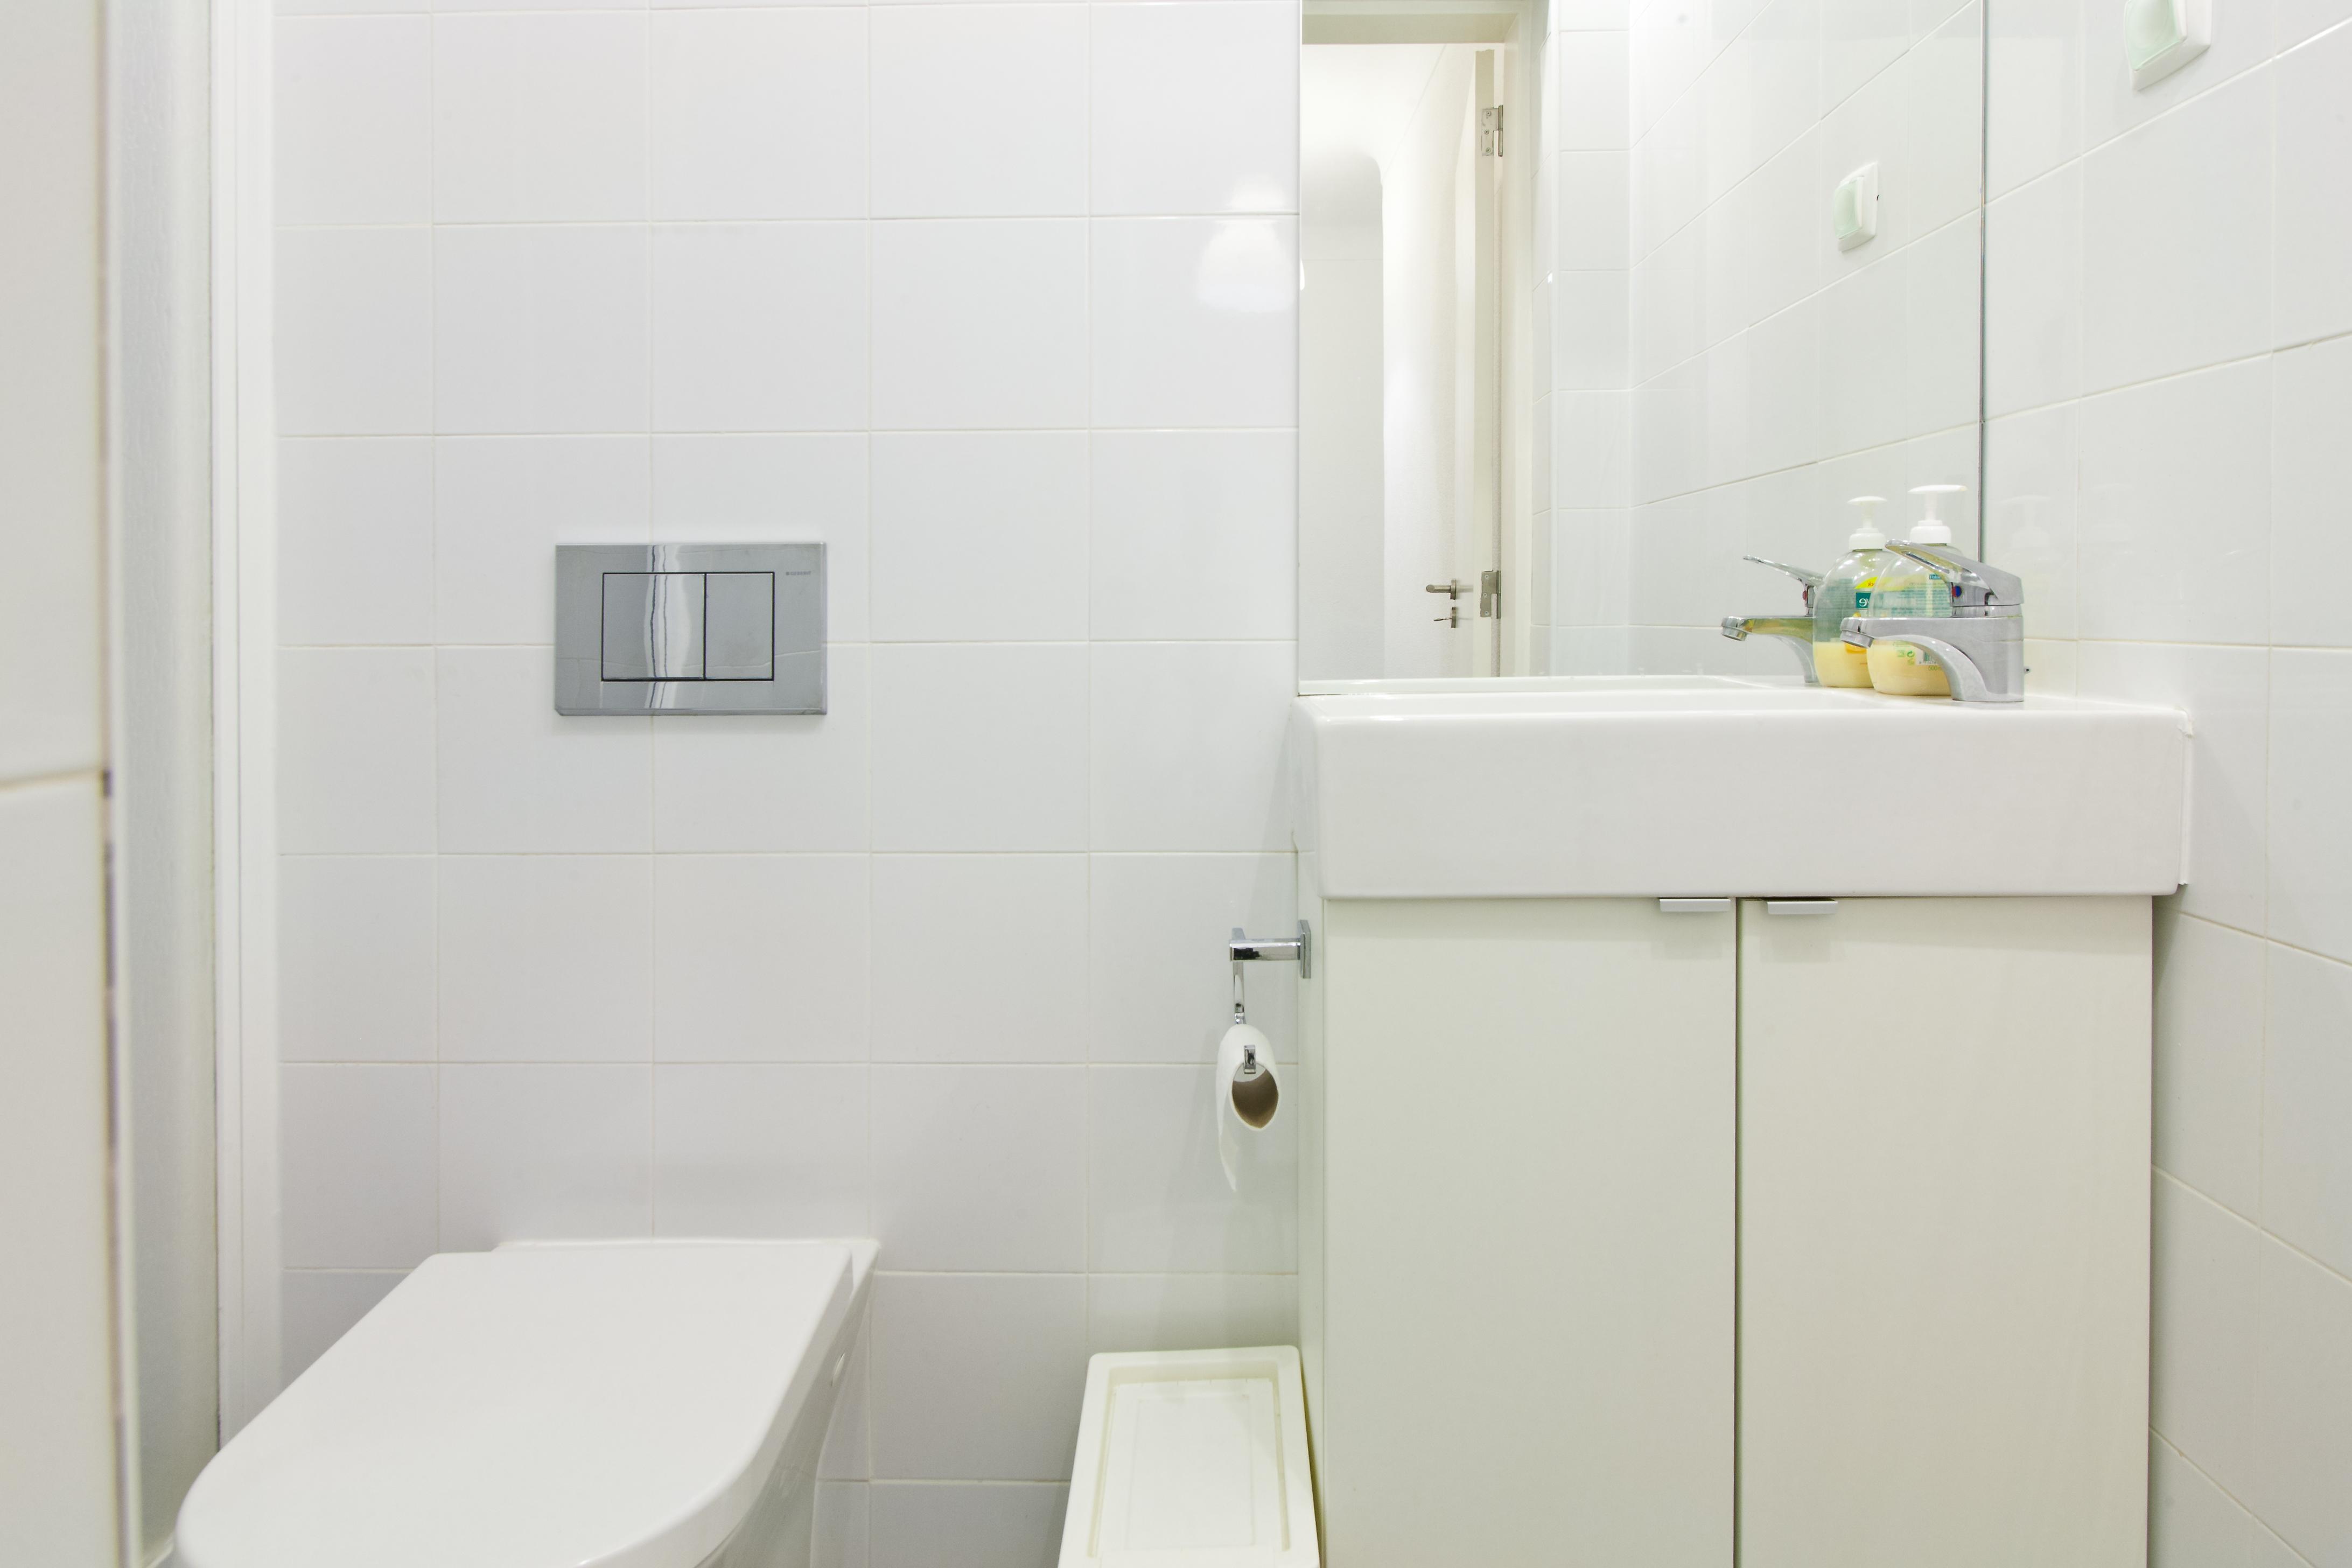 GJ - Bathroom nº2 - Quartos.Rooms nº1, 5, 6 - Foto 1.jpg